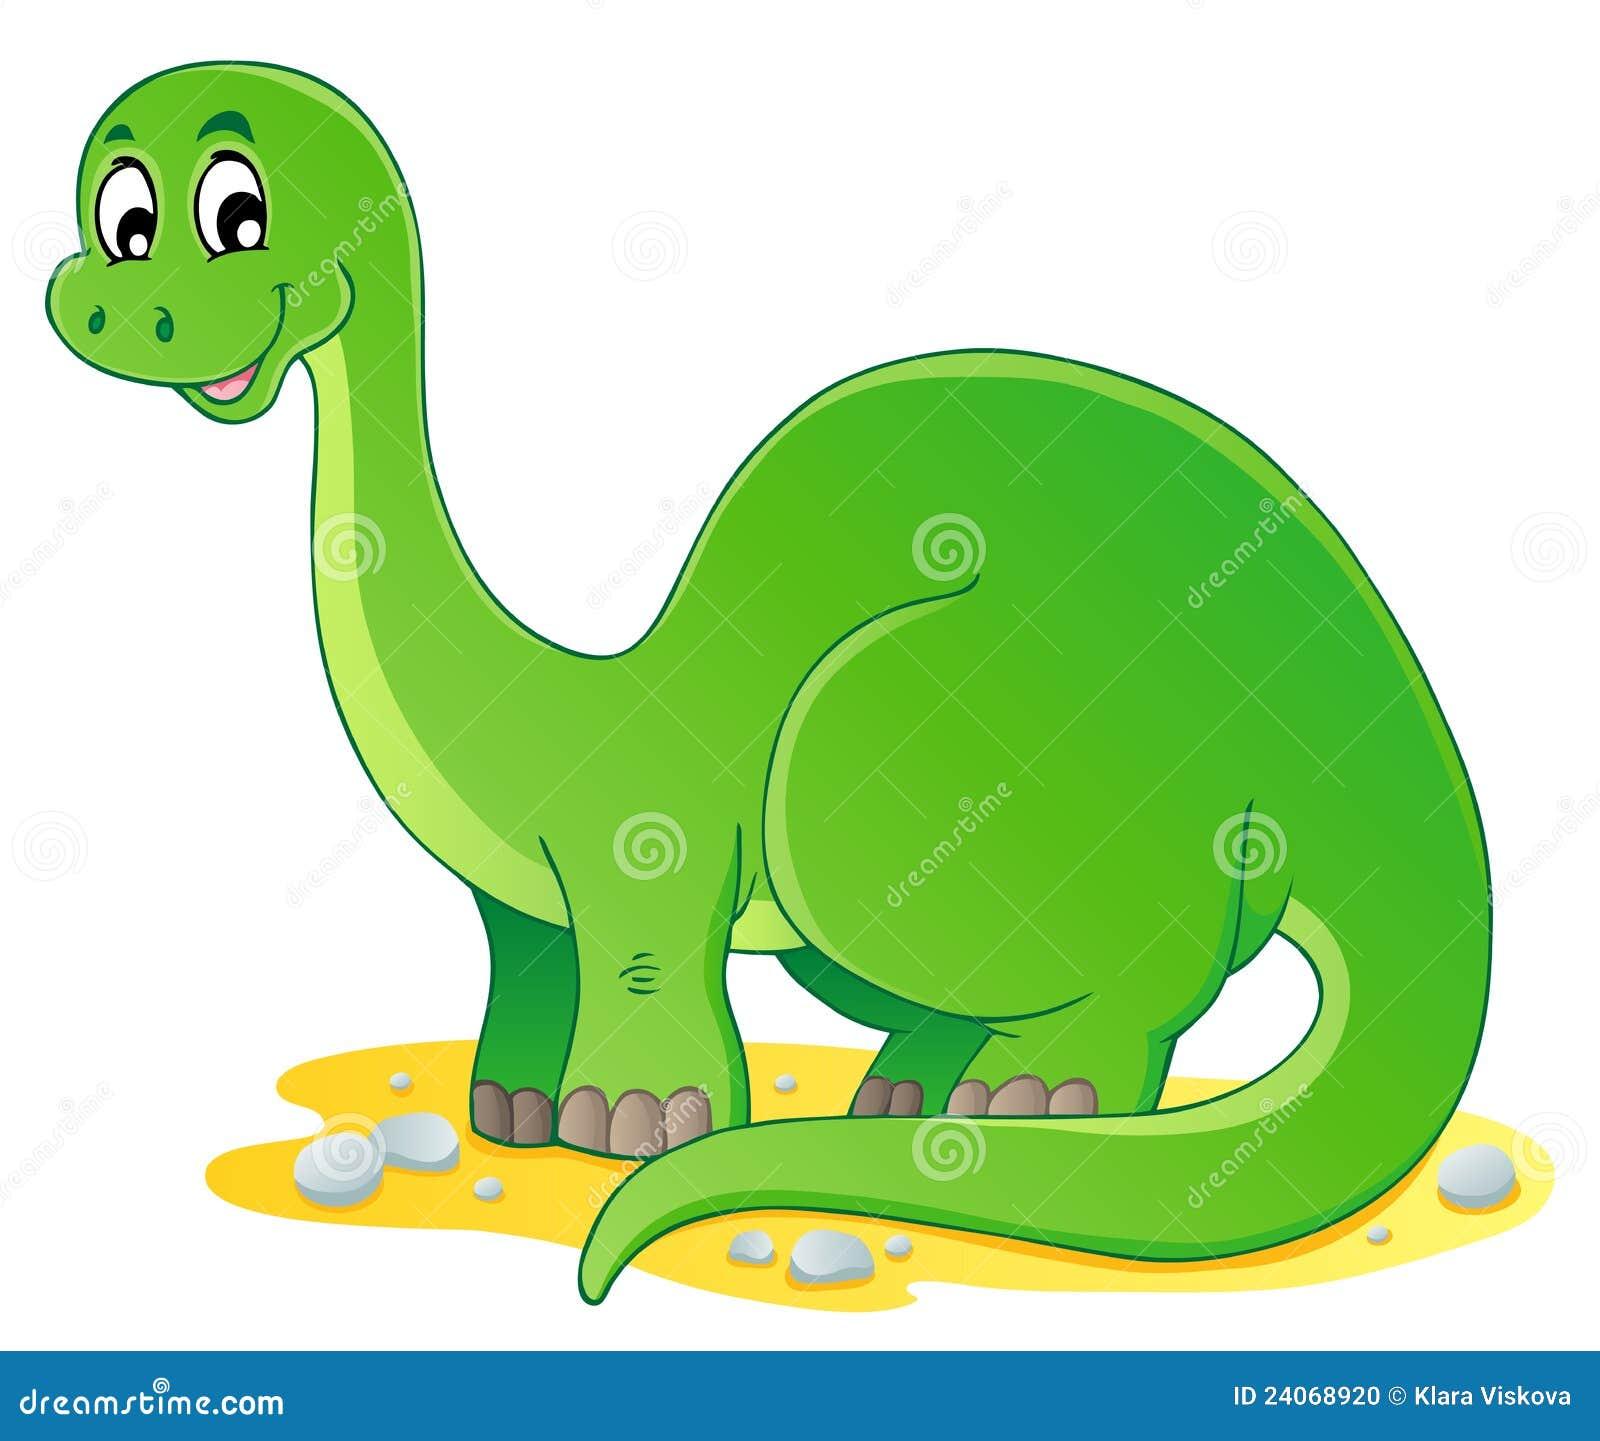 Dinosaur theme image 1 stock vector. Illustration of ...